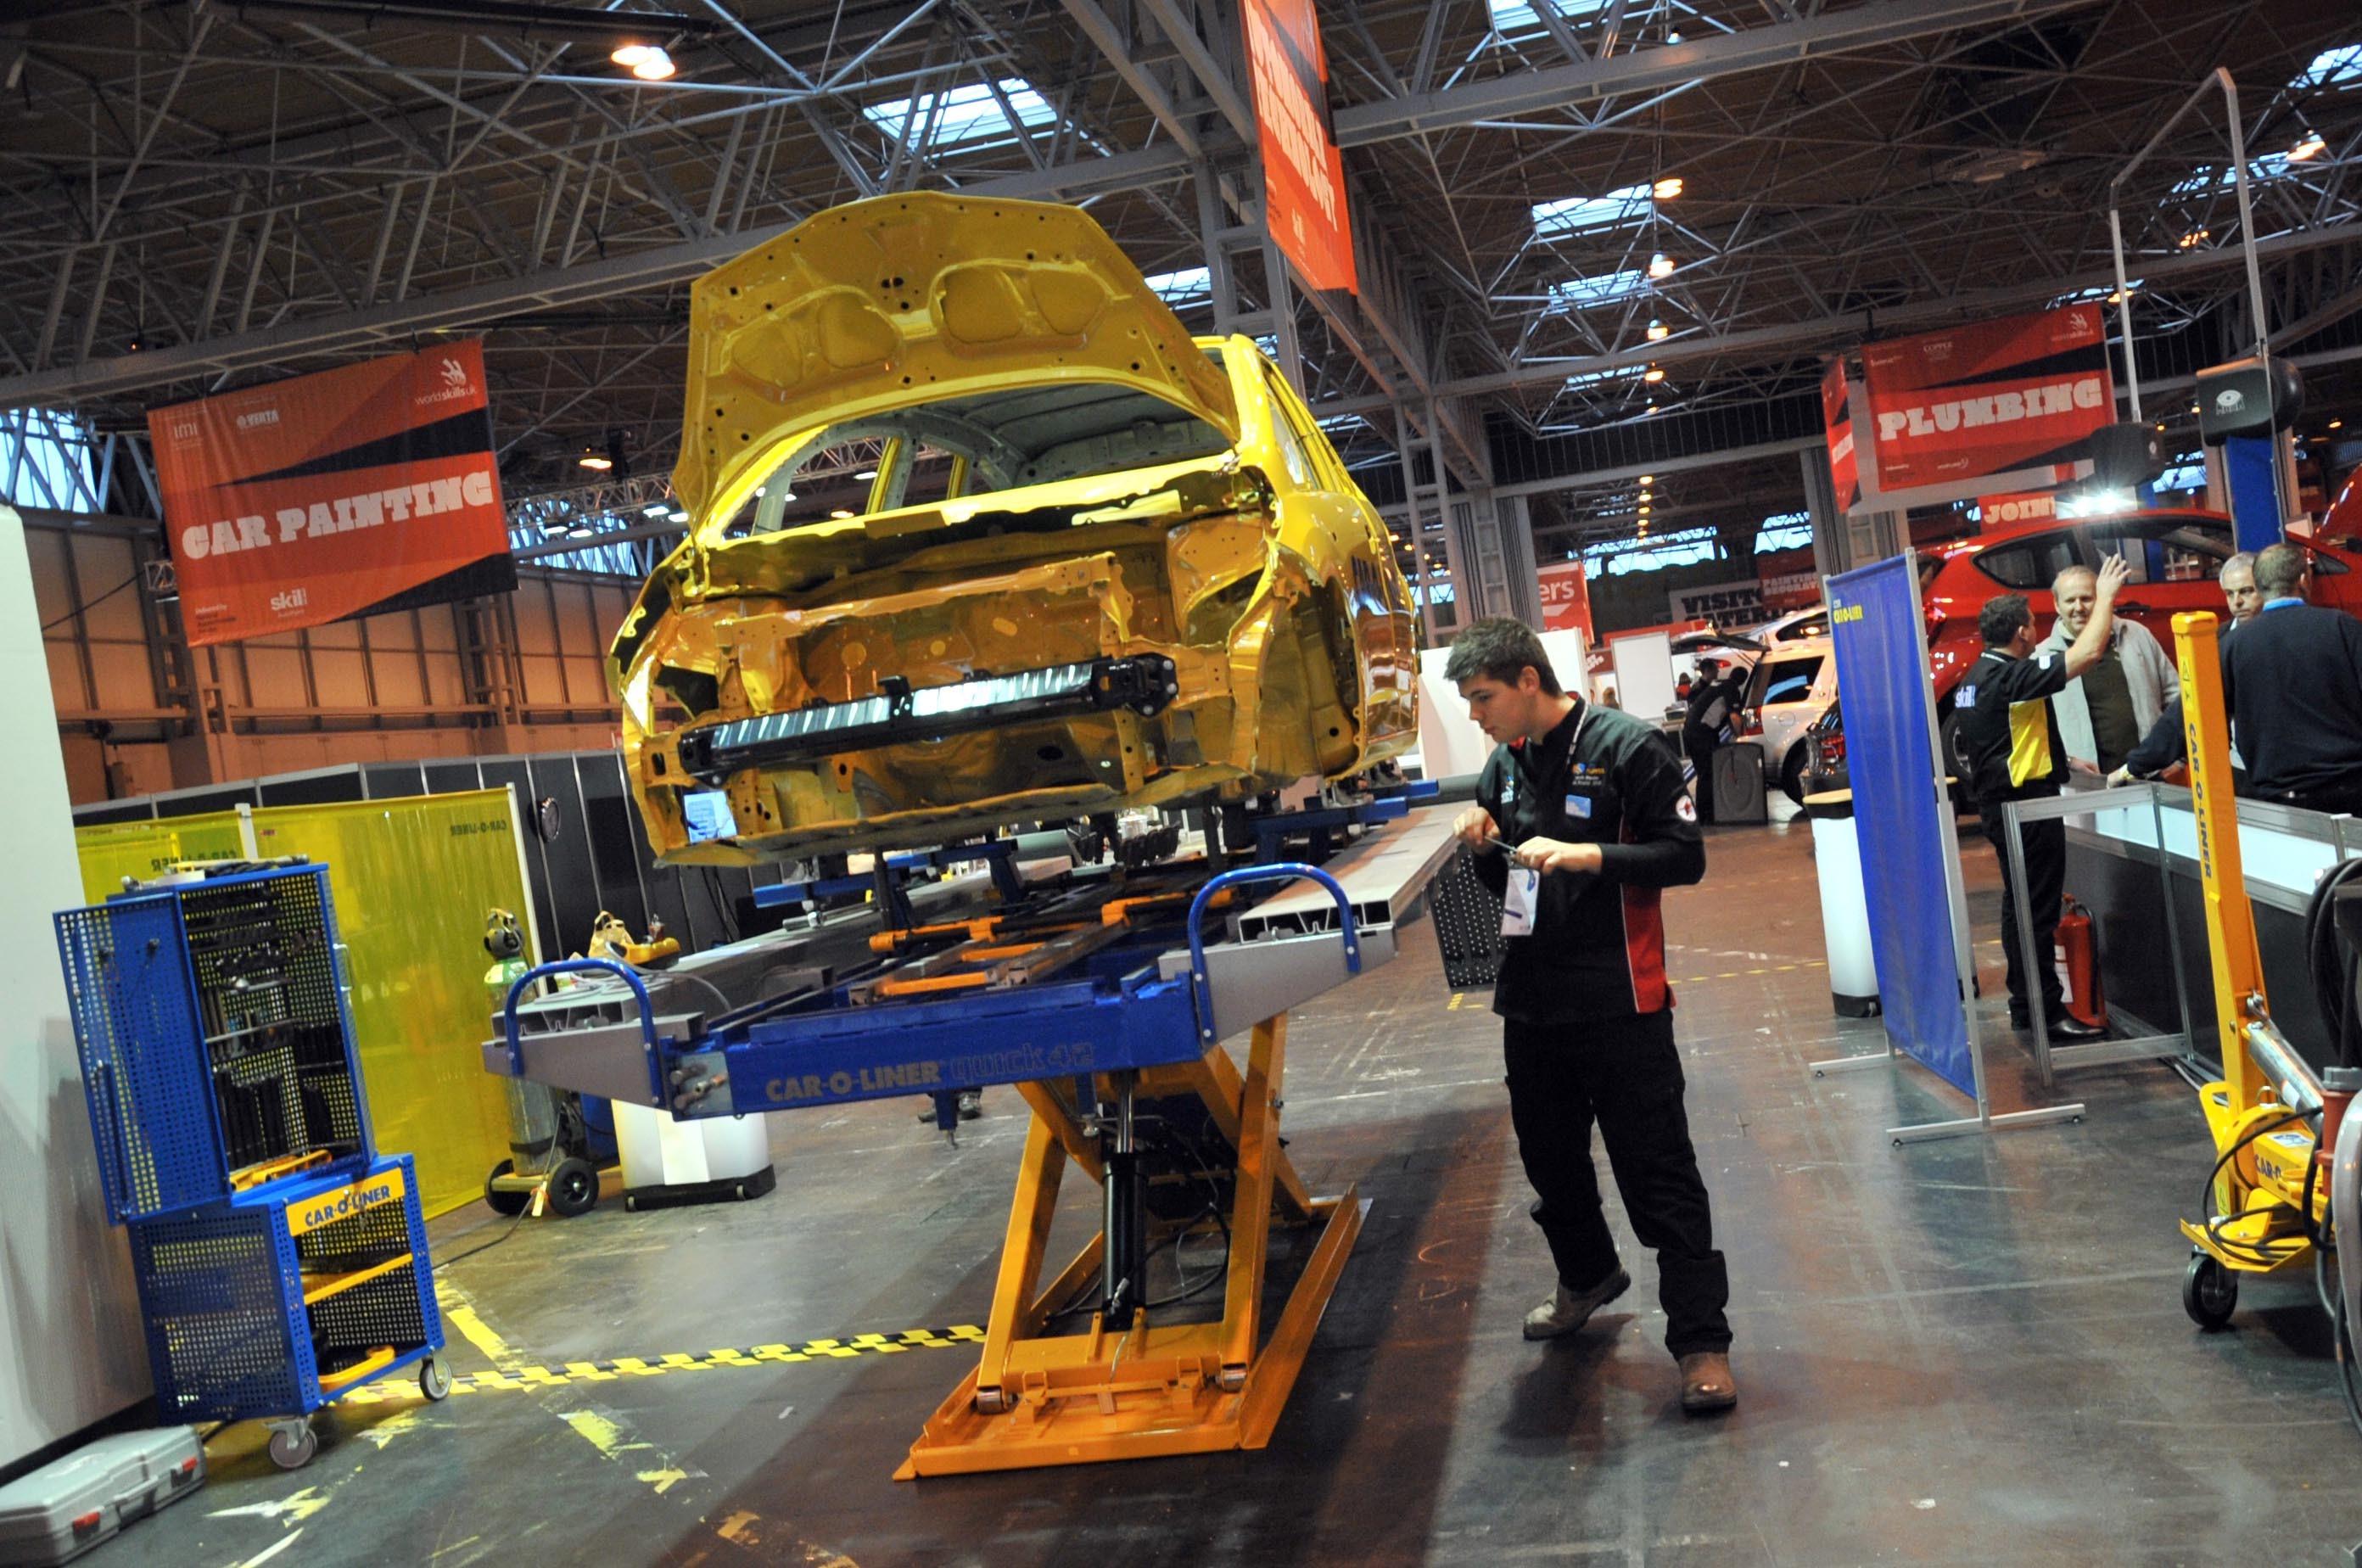 WorldSkills UK Skills Show Engineering Automobile Technology